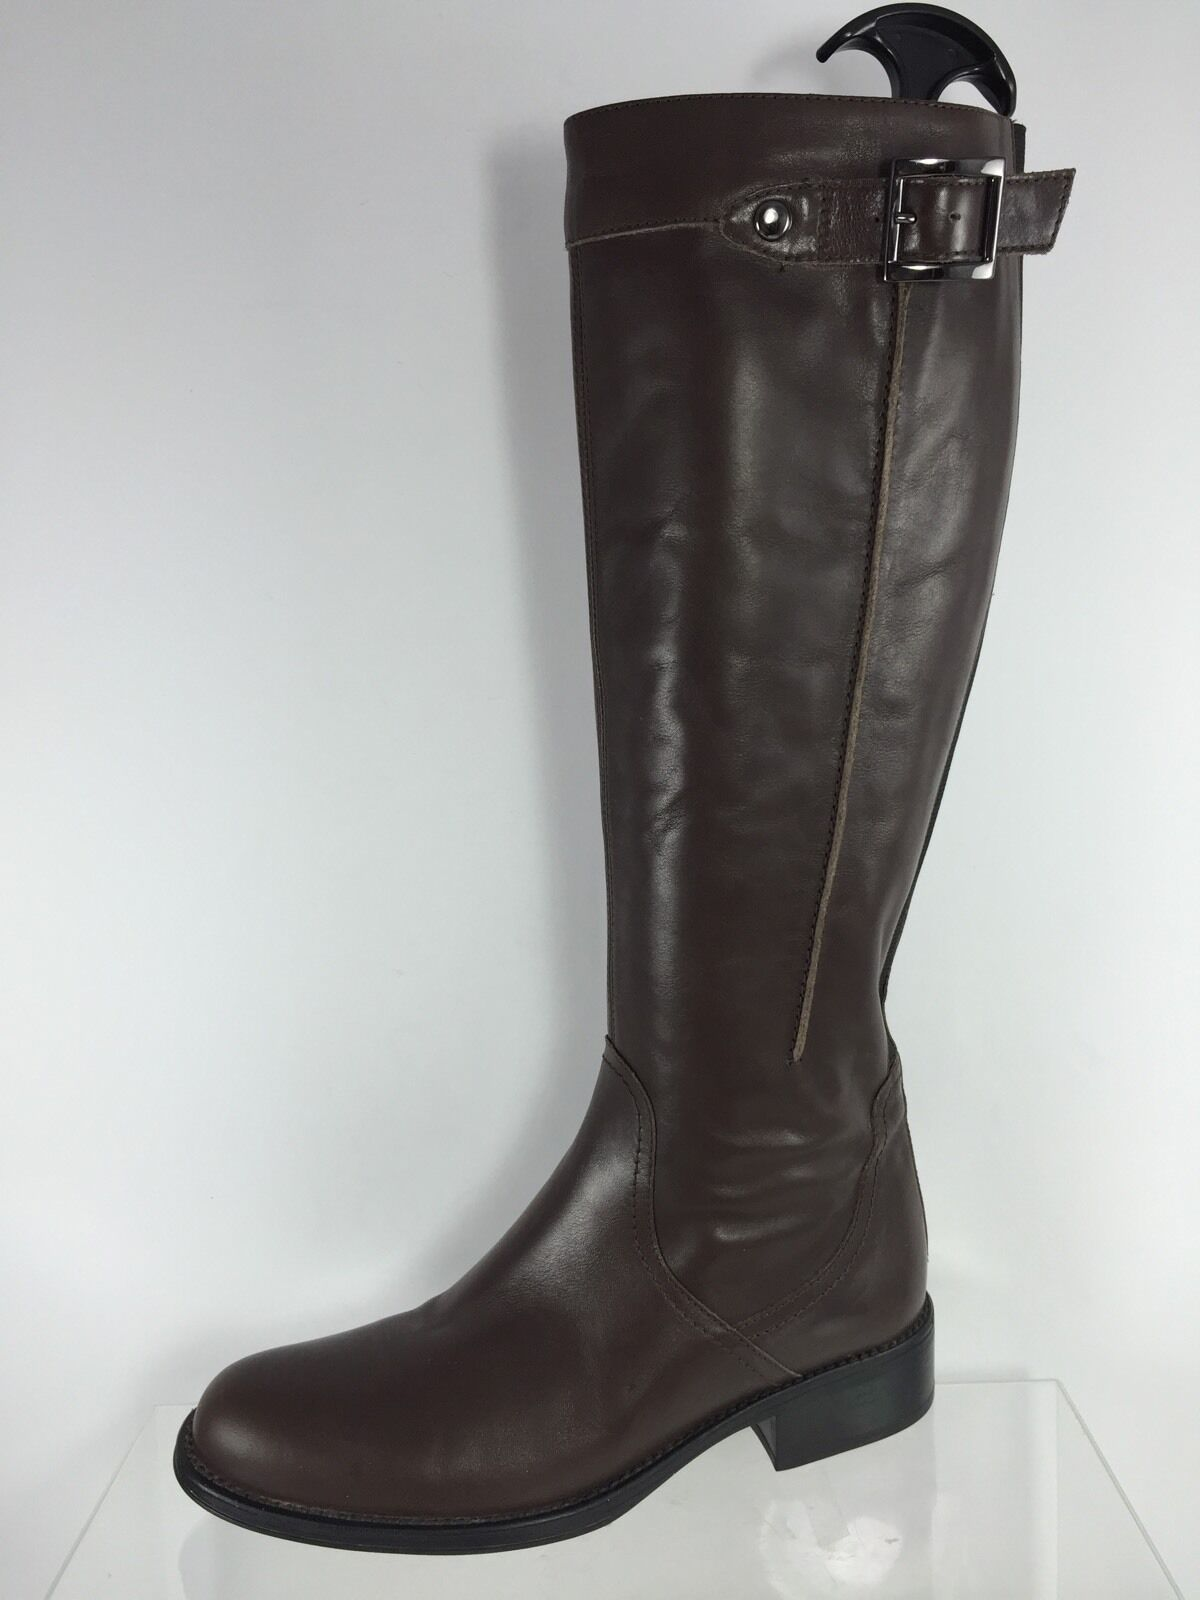 Aquatalia Womens Brown Leather Knee Boots 6.5